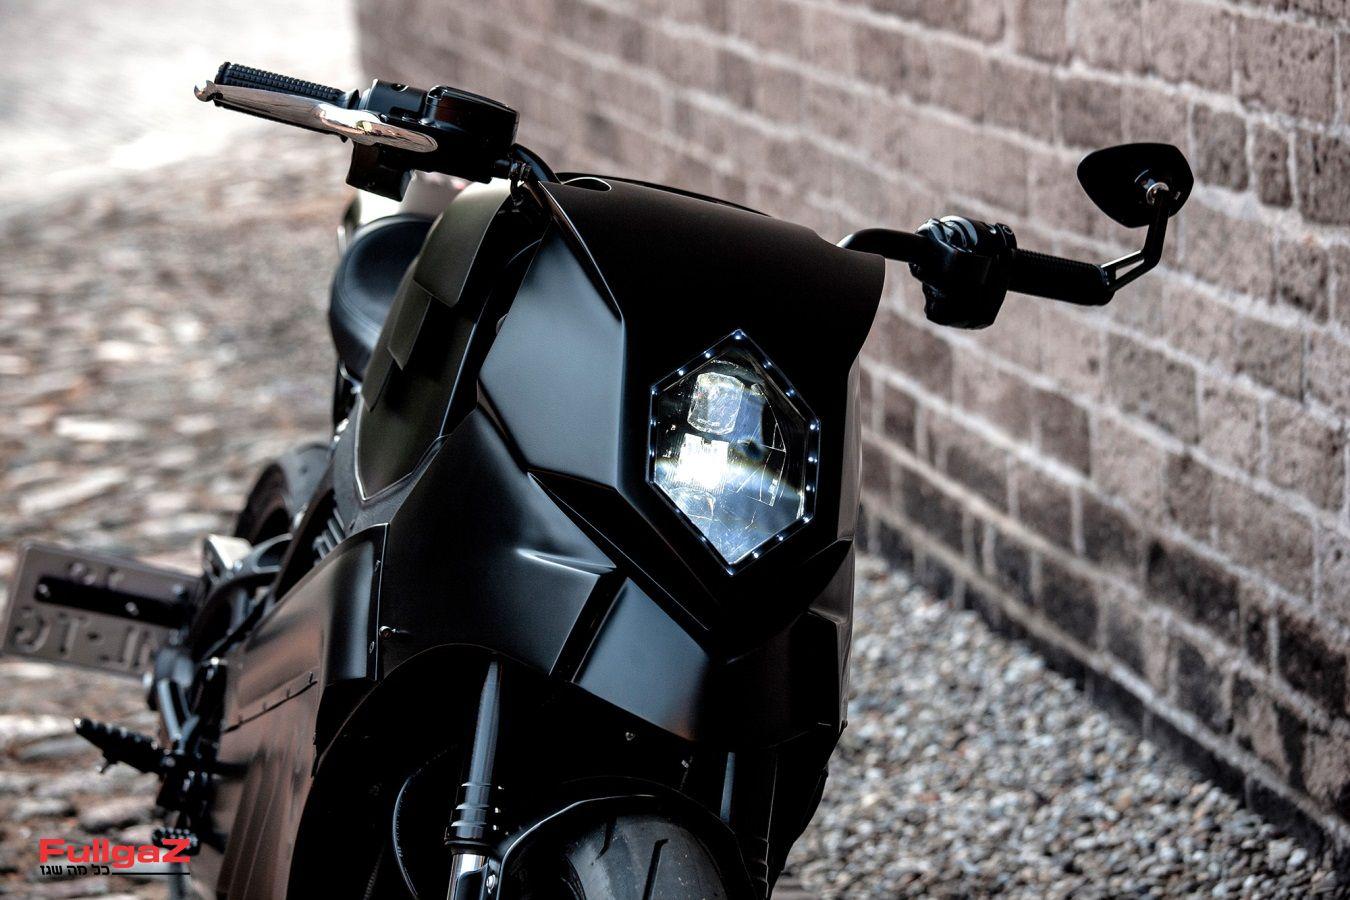 Moto-Adonis-harley-davidson-livewire-custom-29